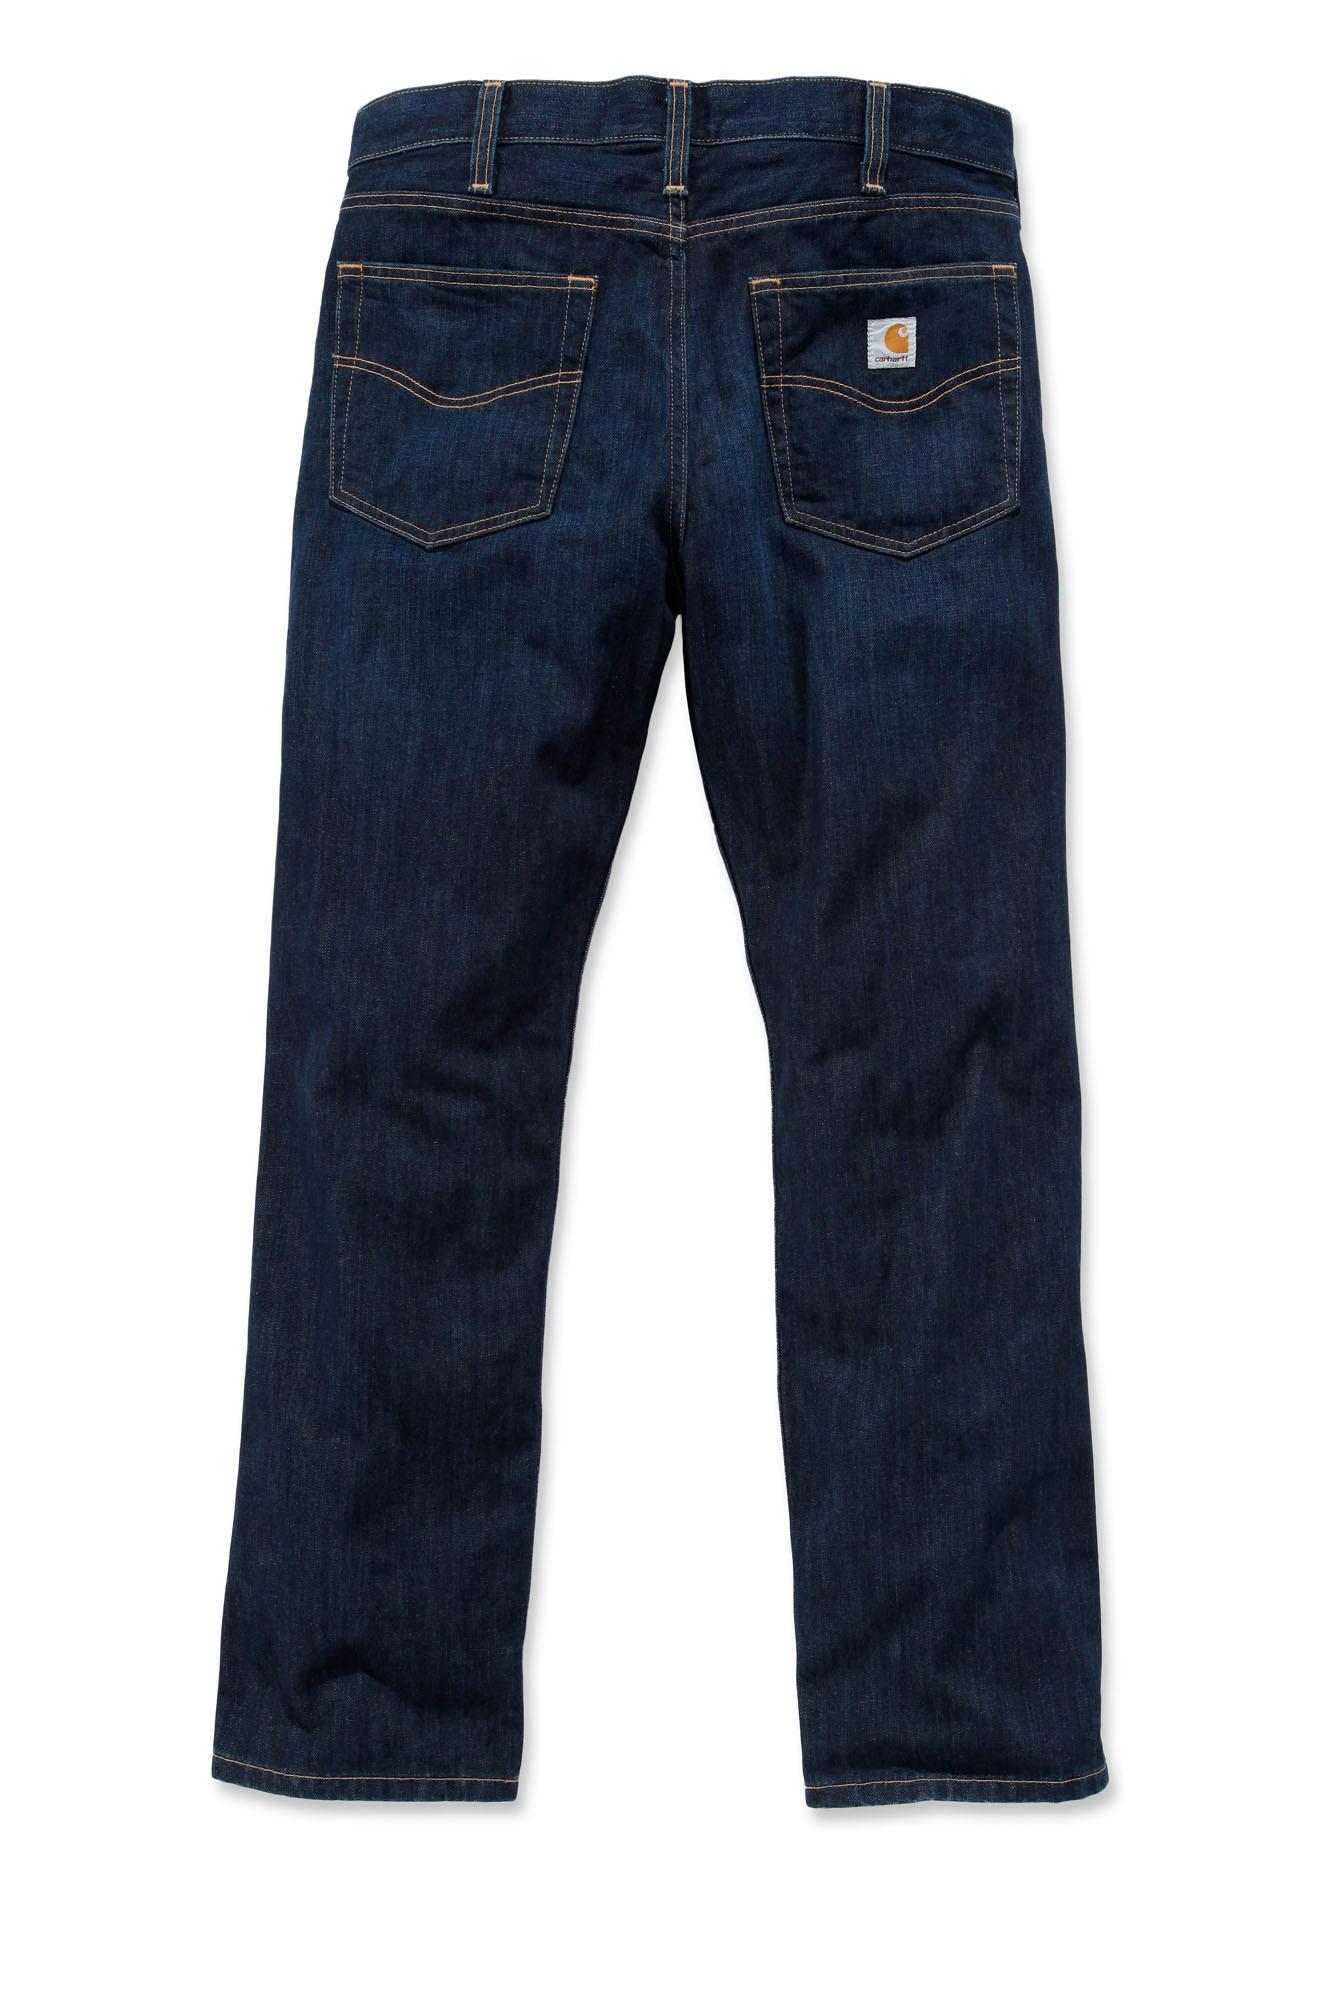 Carhartt Straight Leg Jeans : Weathered Indigo